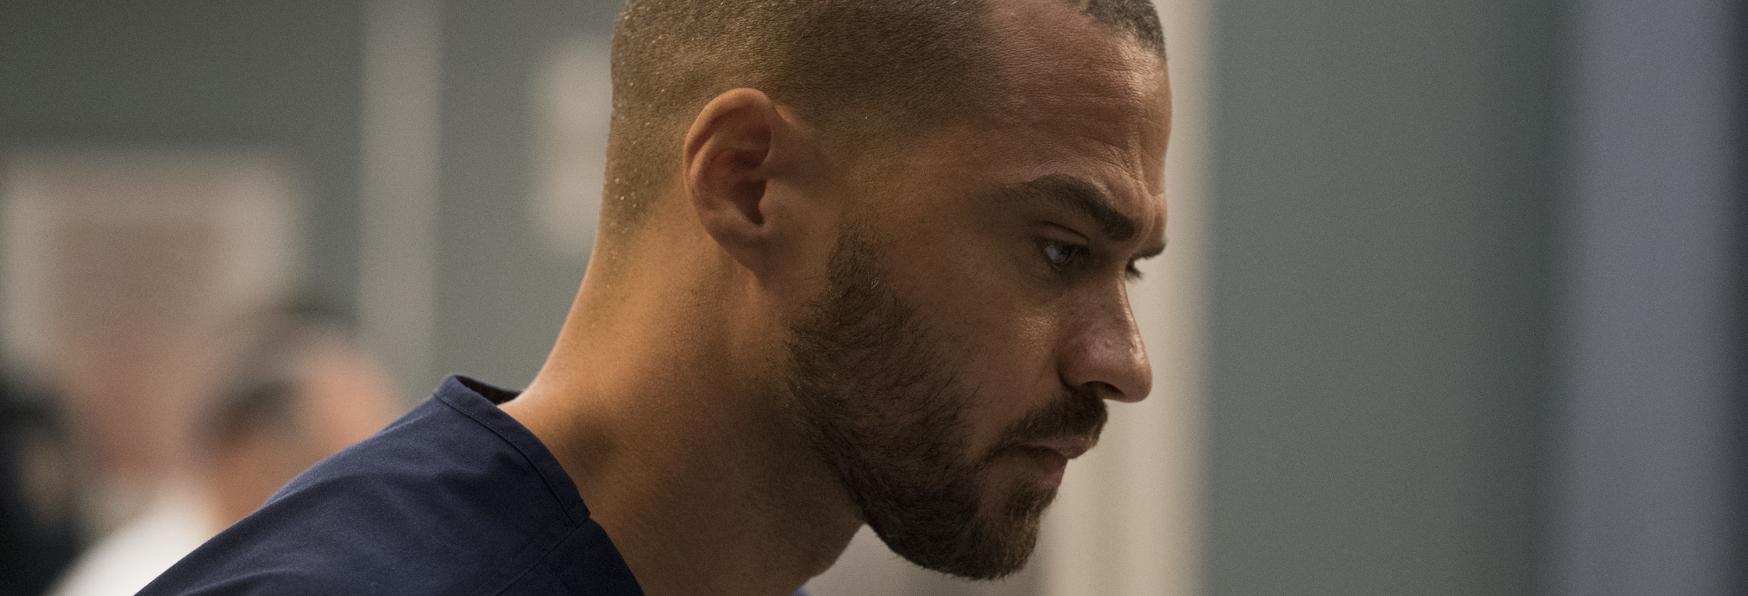 Grey's Anatomy: Jesse Williams lascia la Serie TV dopo 12 Stagioni